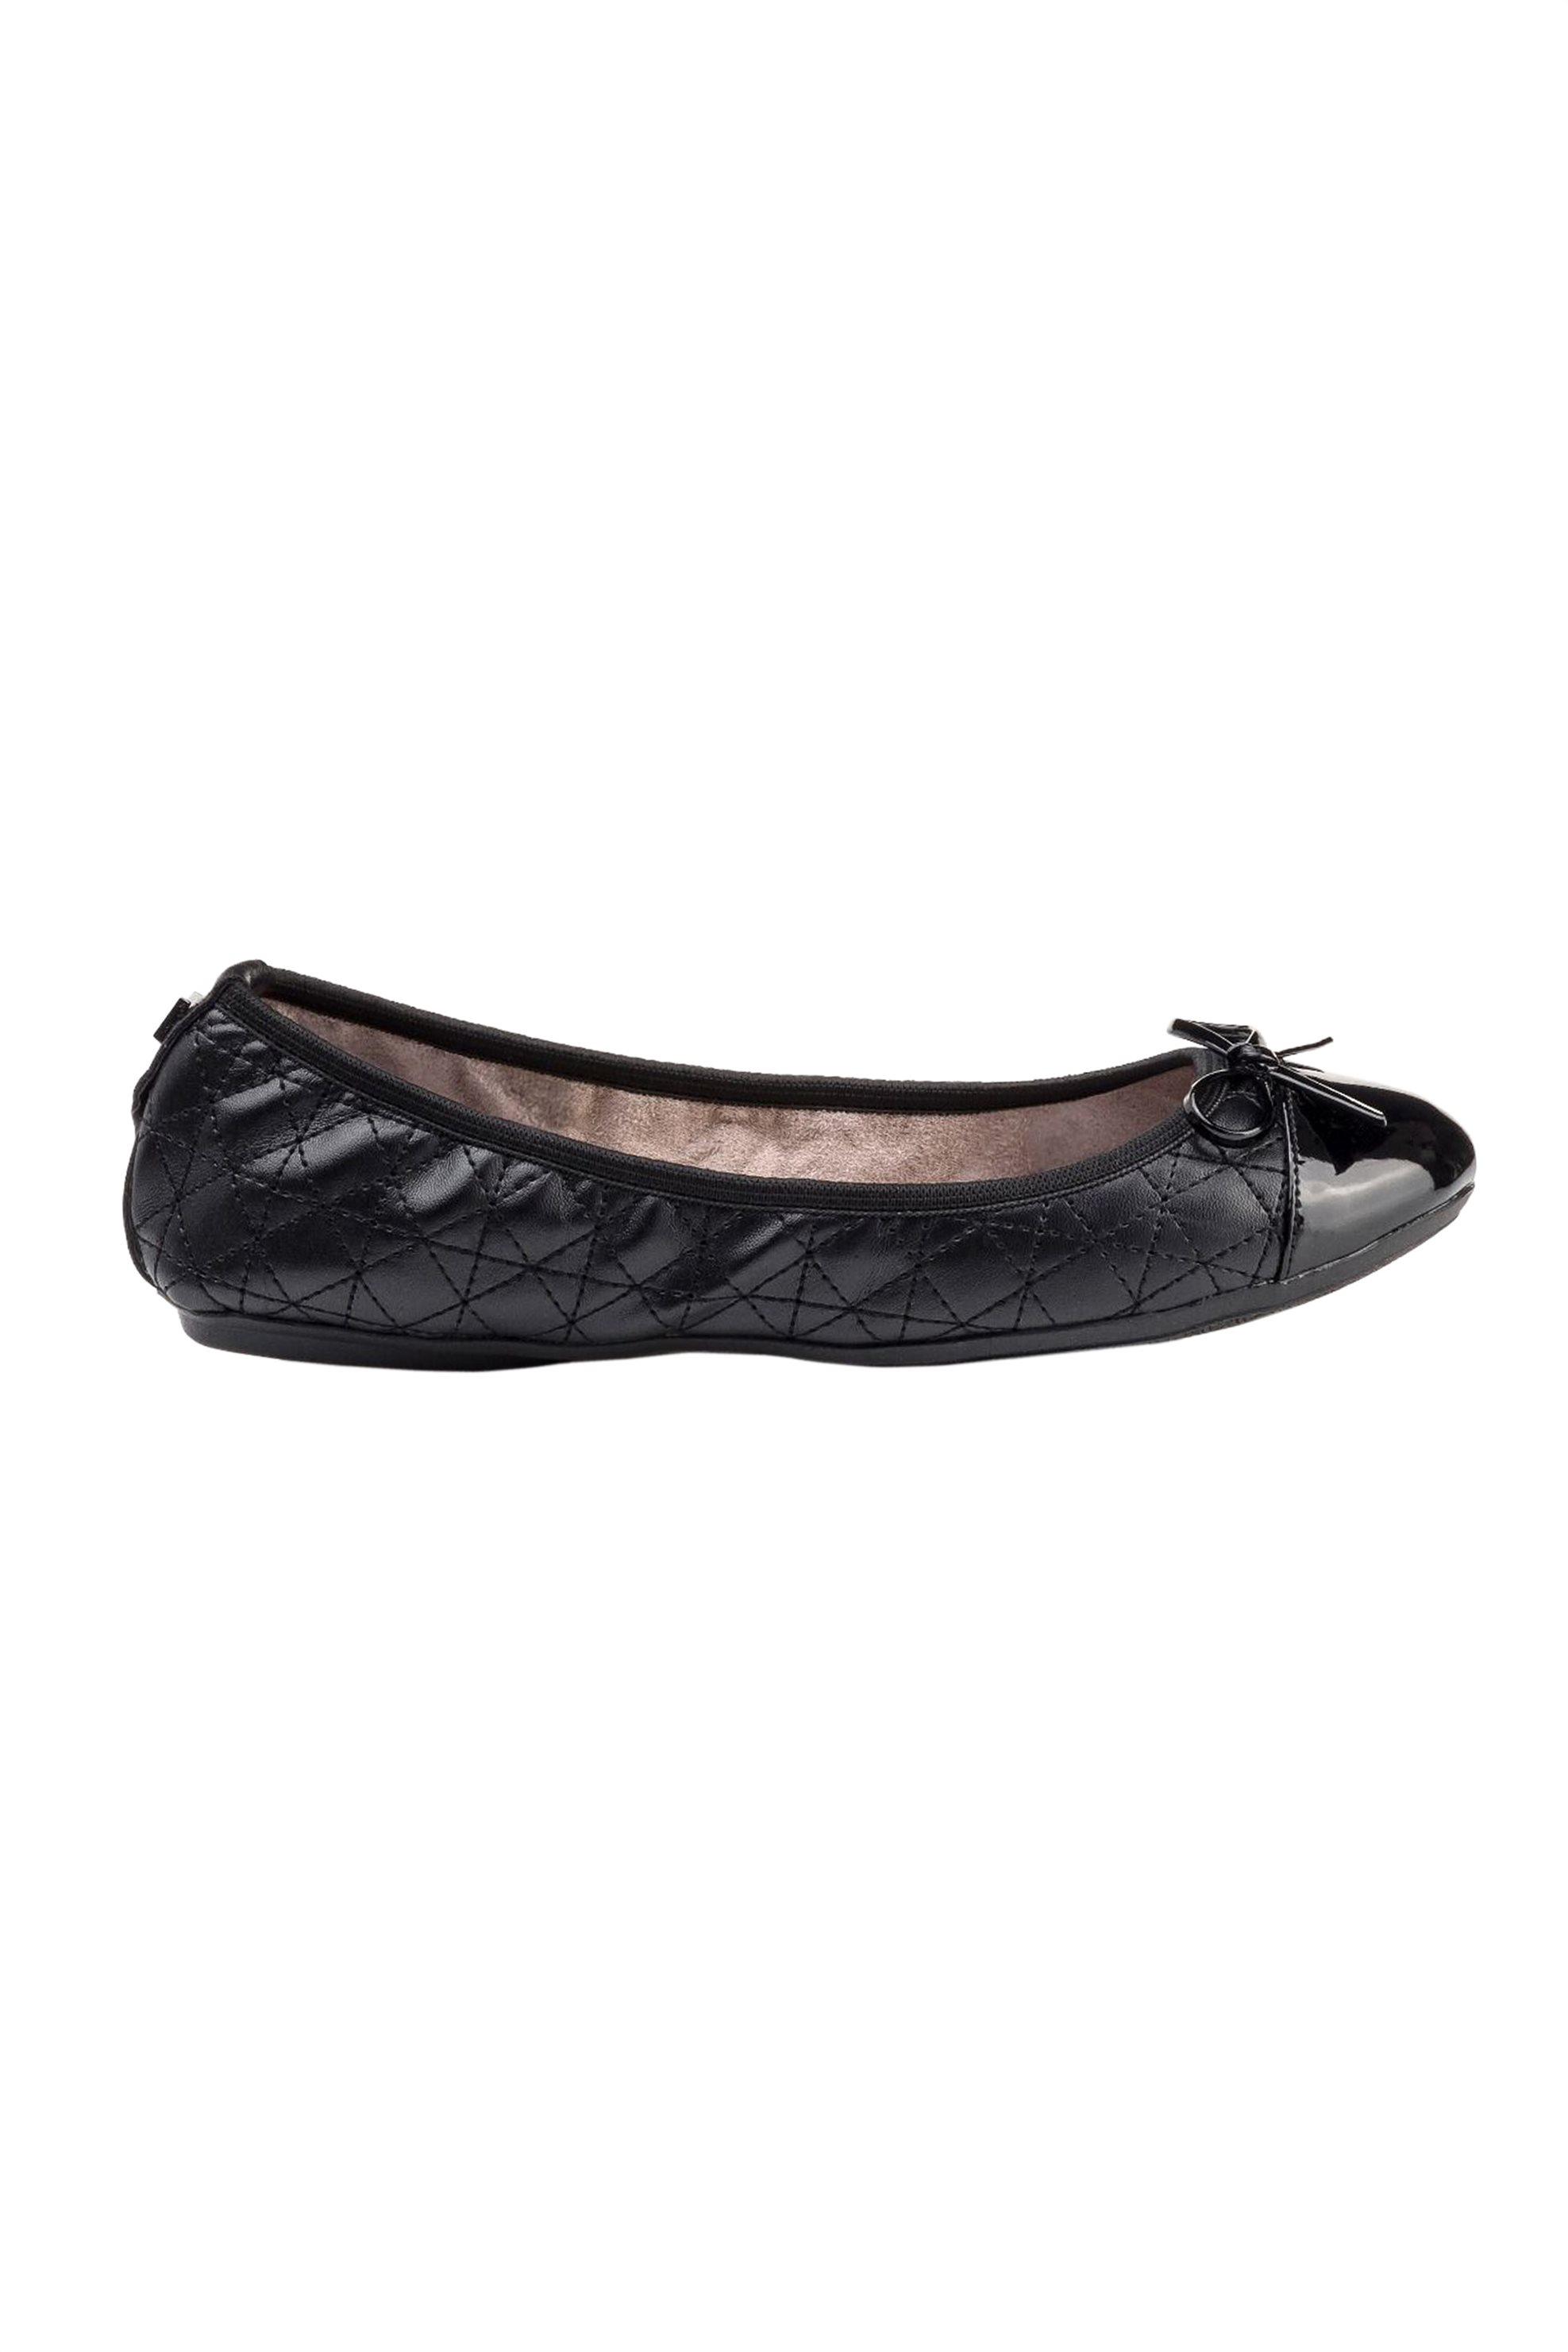 Butterfly Twists γυναικείες μπαλαρίνες Olivia - 218894-OLIVIA - Μαύρο